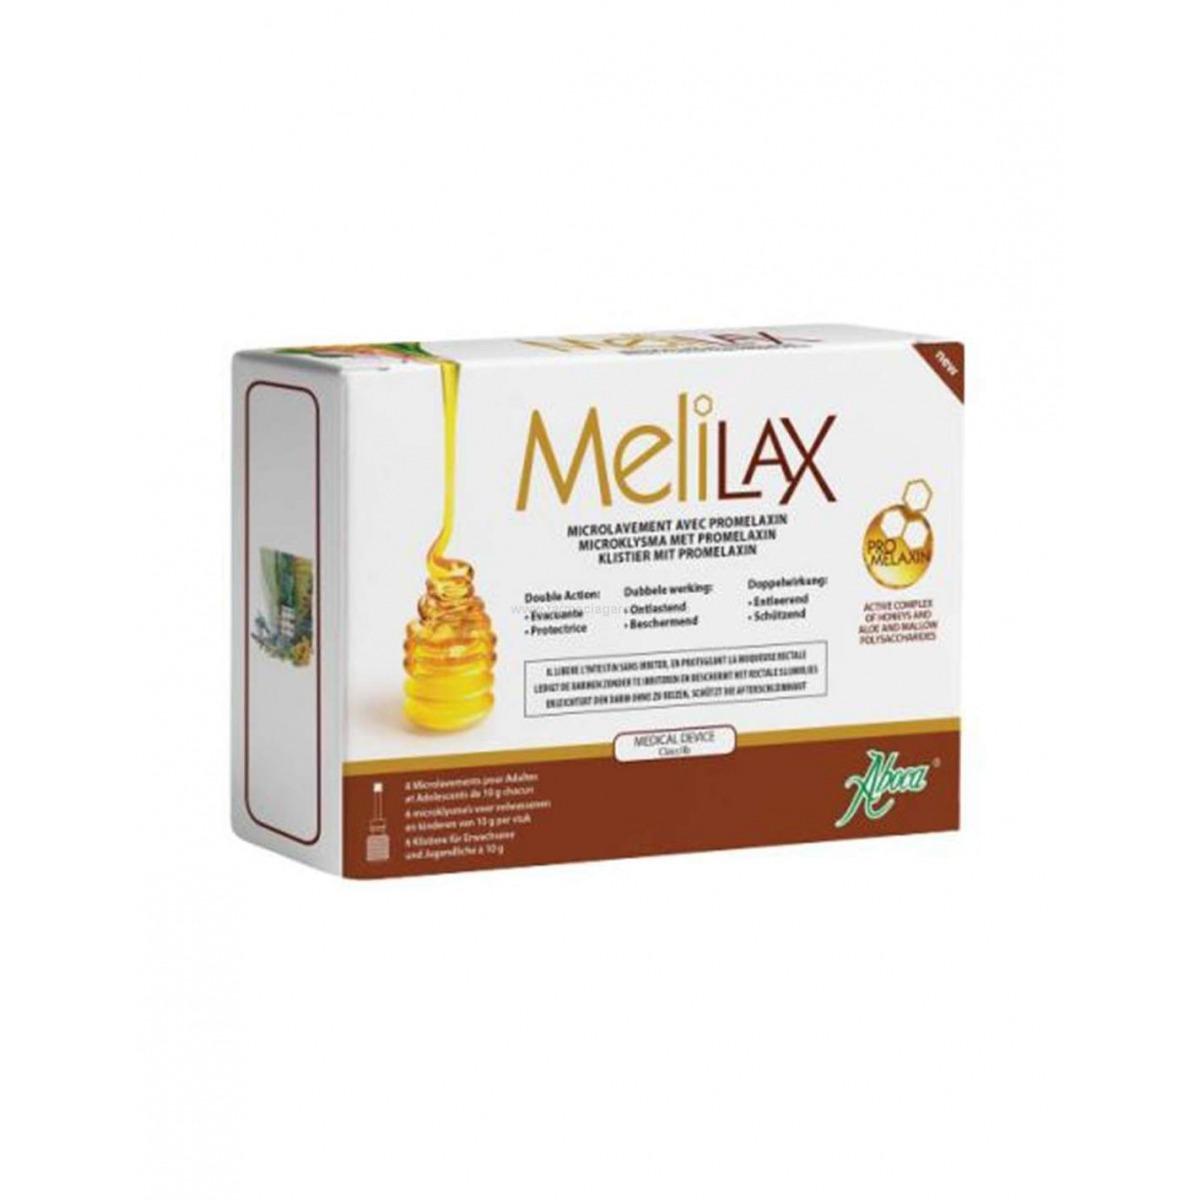 MELILAXMICROENEMAS10G6UNIDADES I1